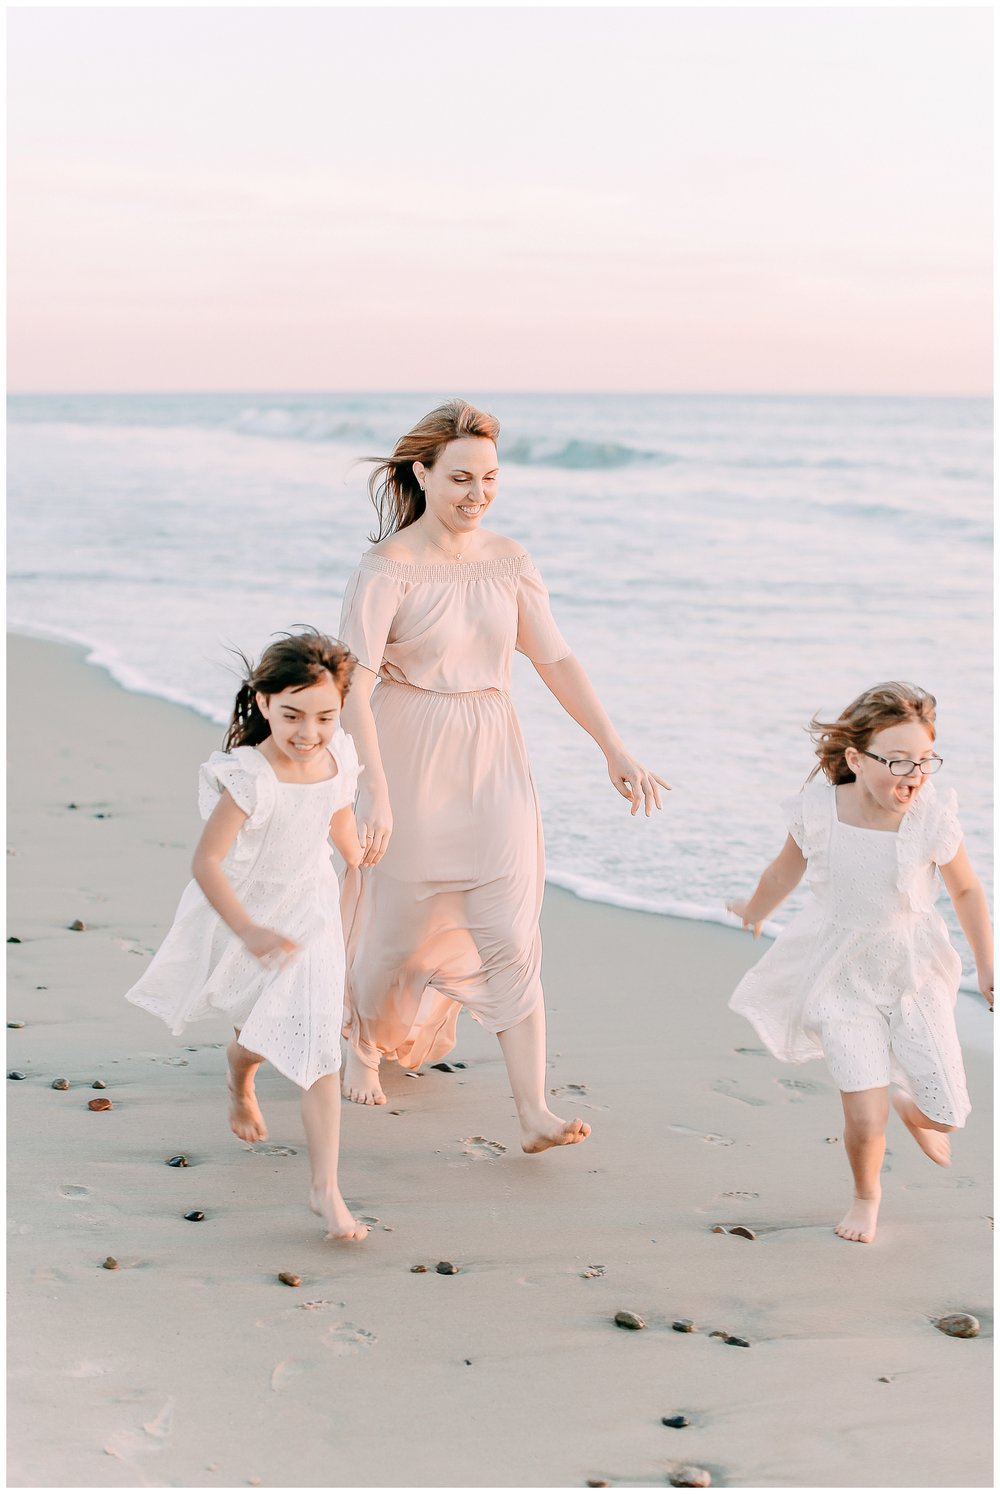 San_clemente_family_session_Orange_county_family_photographer_cori_kleckner_photography_laguna_beach_family_session_0702.jpg